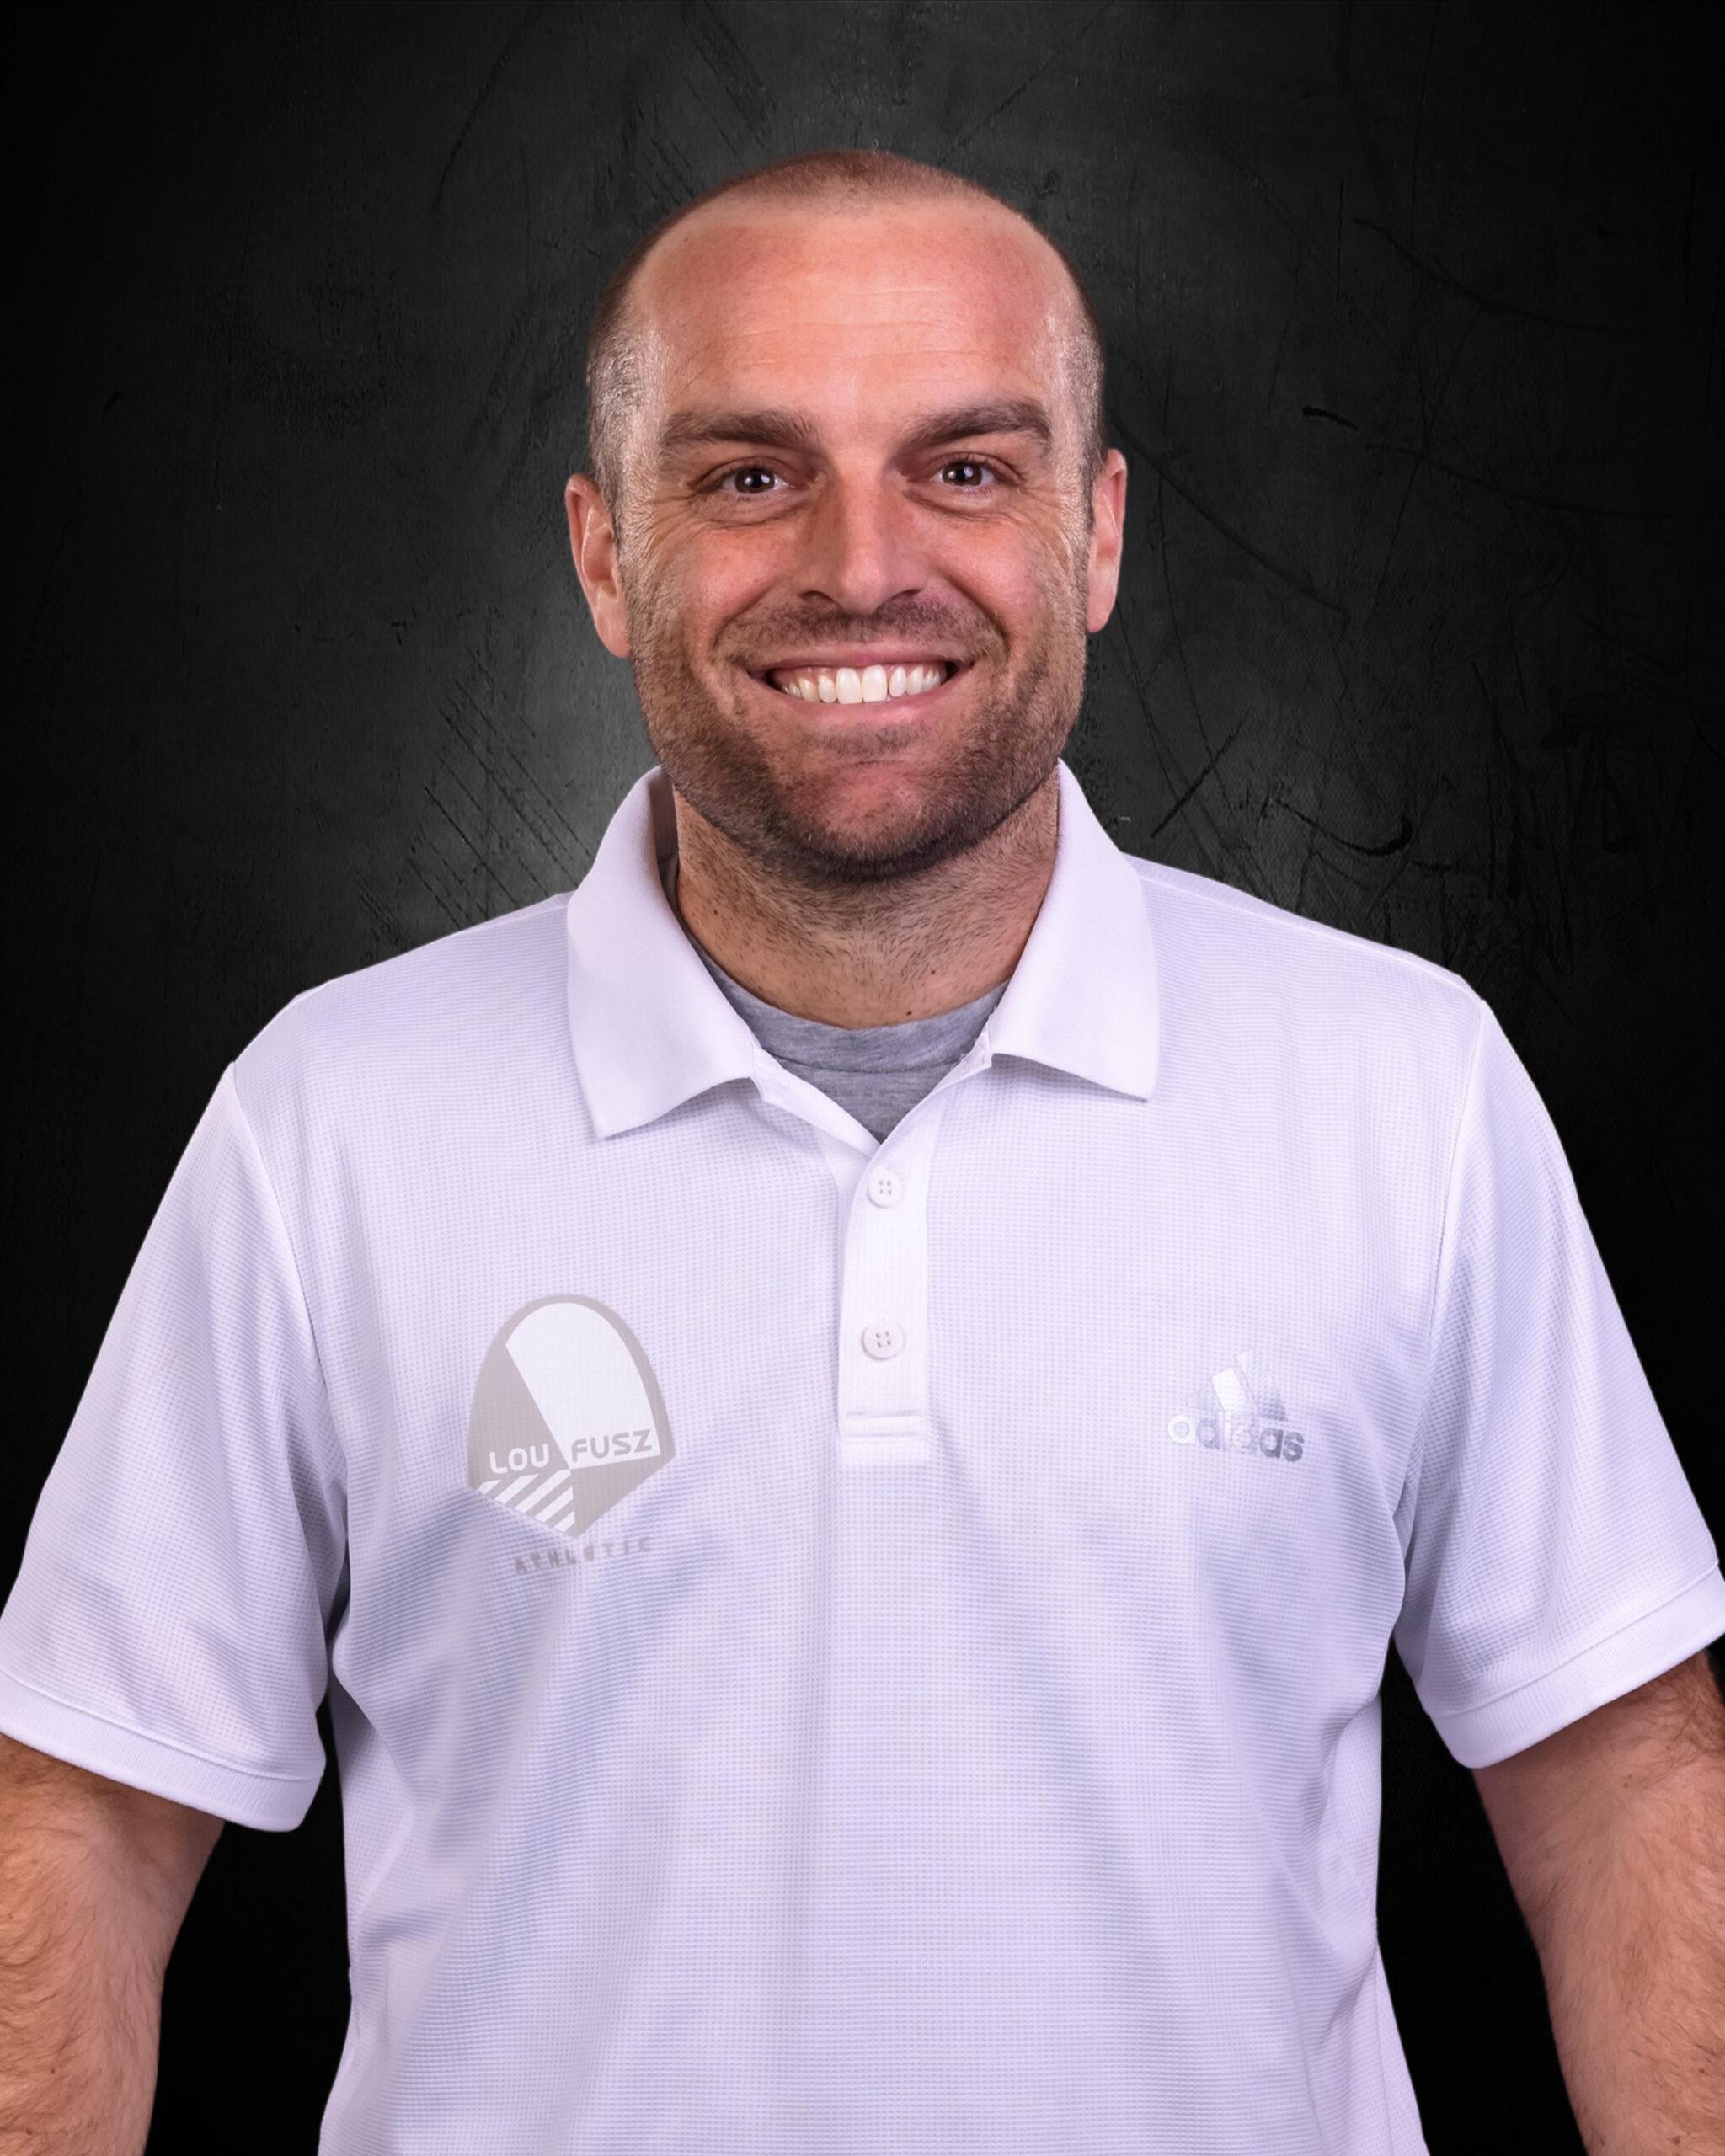 Lou Fusz Athletic - MLS Next Coaching Staff